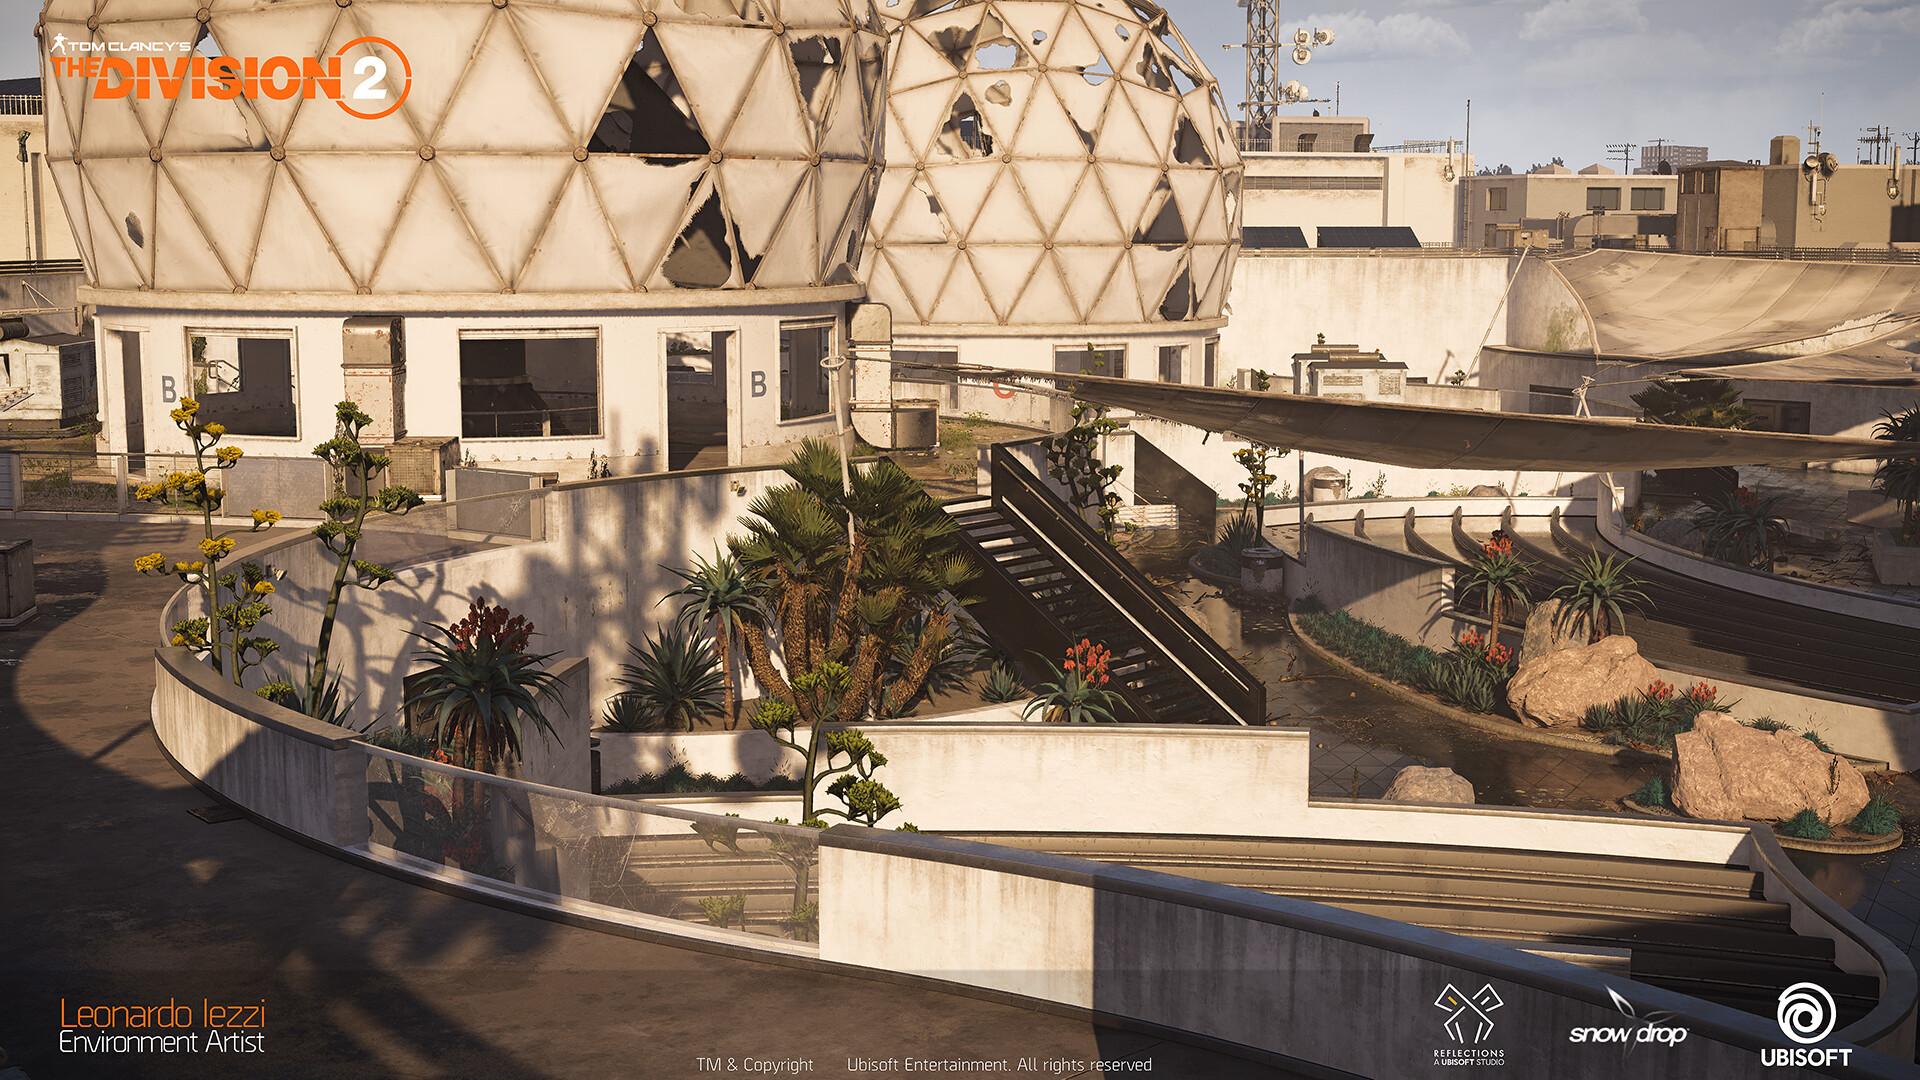 Leonardo iezzi leonardo iezzi the division 2 environment art 04 rooftop 005